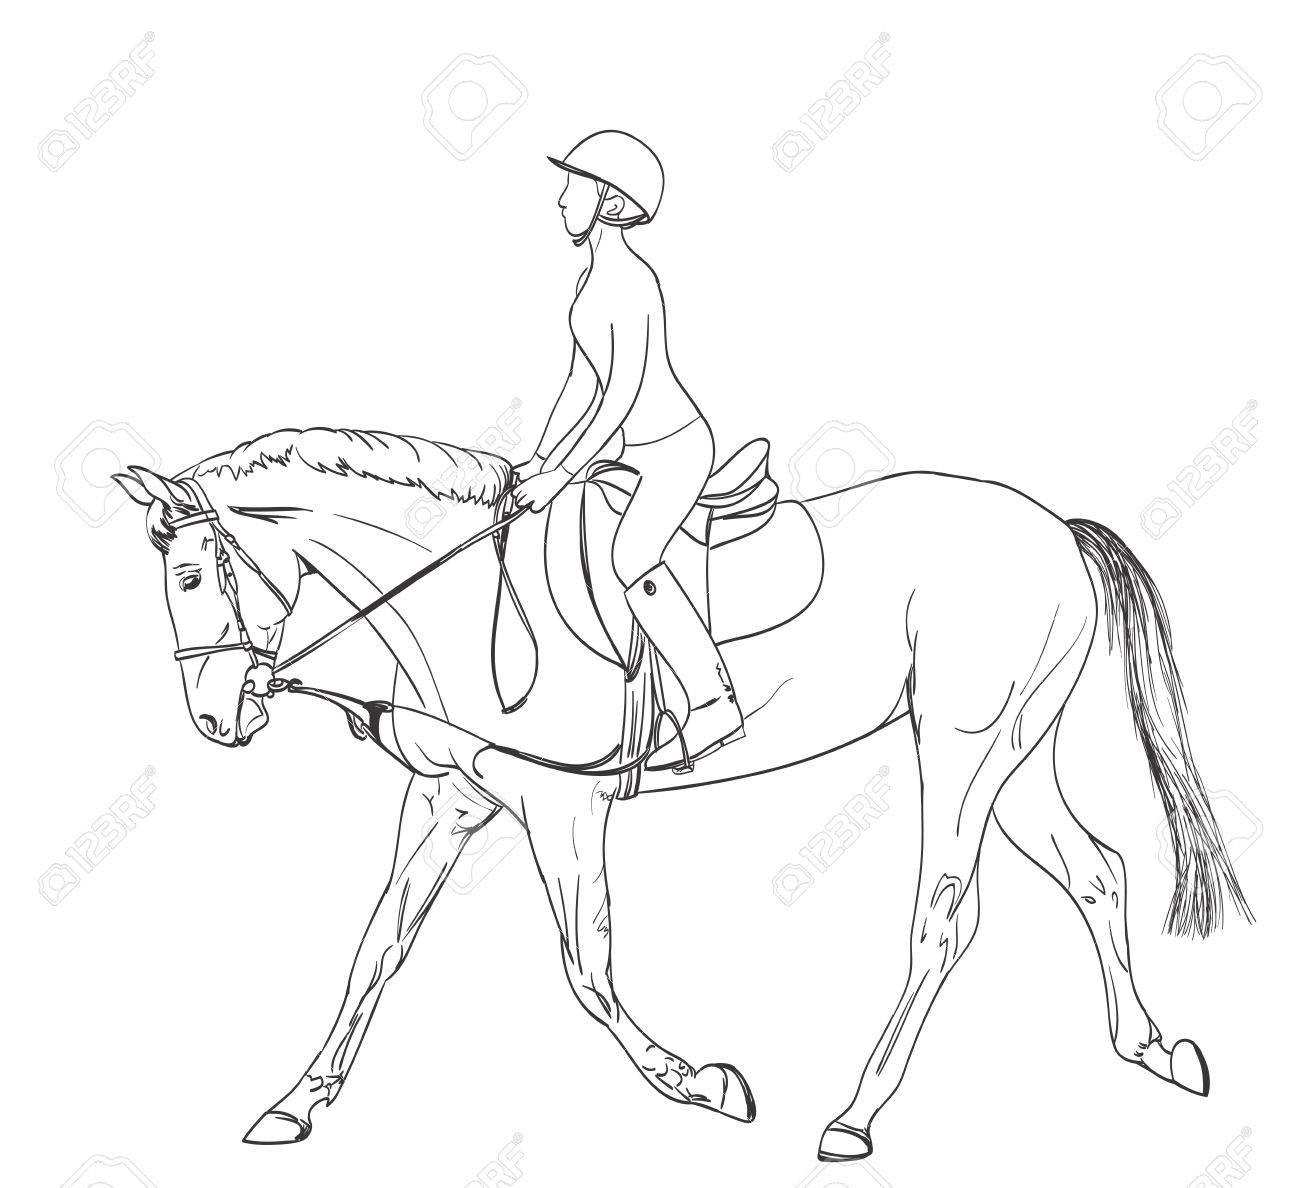 1300x1188 Horse Rider Line Art Drawing. Equestrian Sport Training Theme